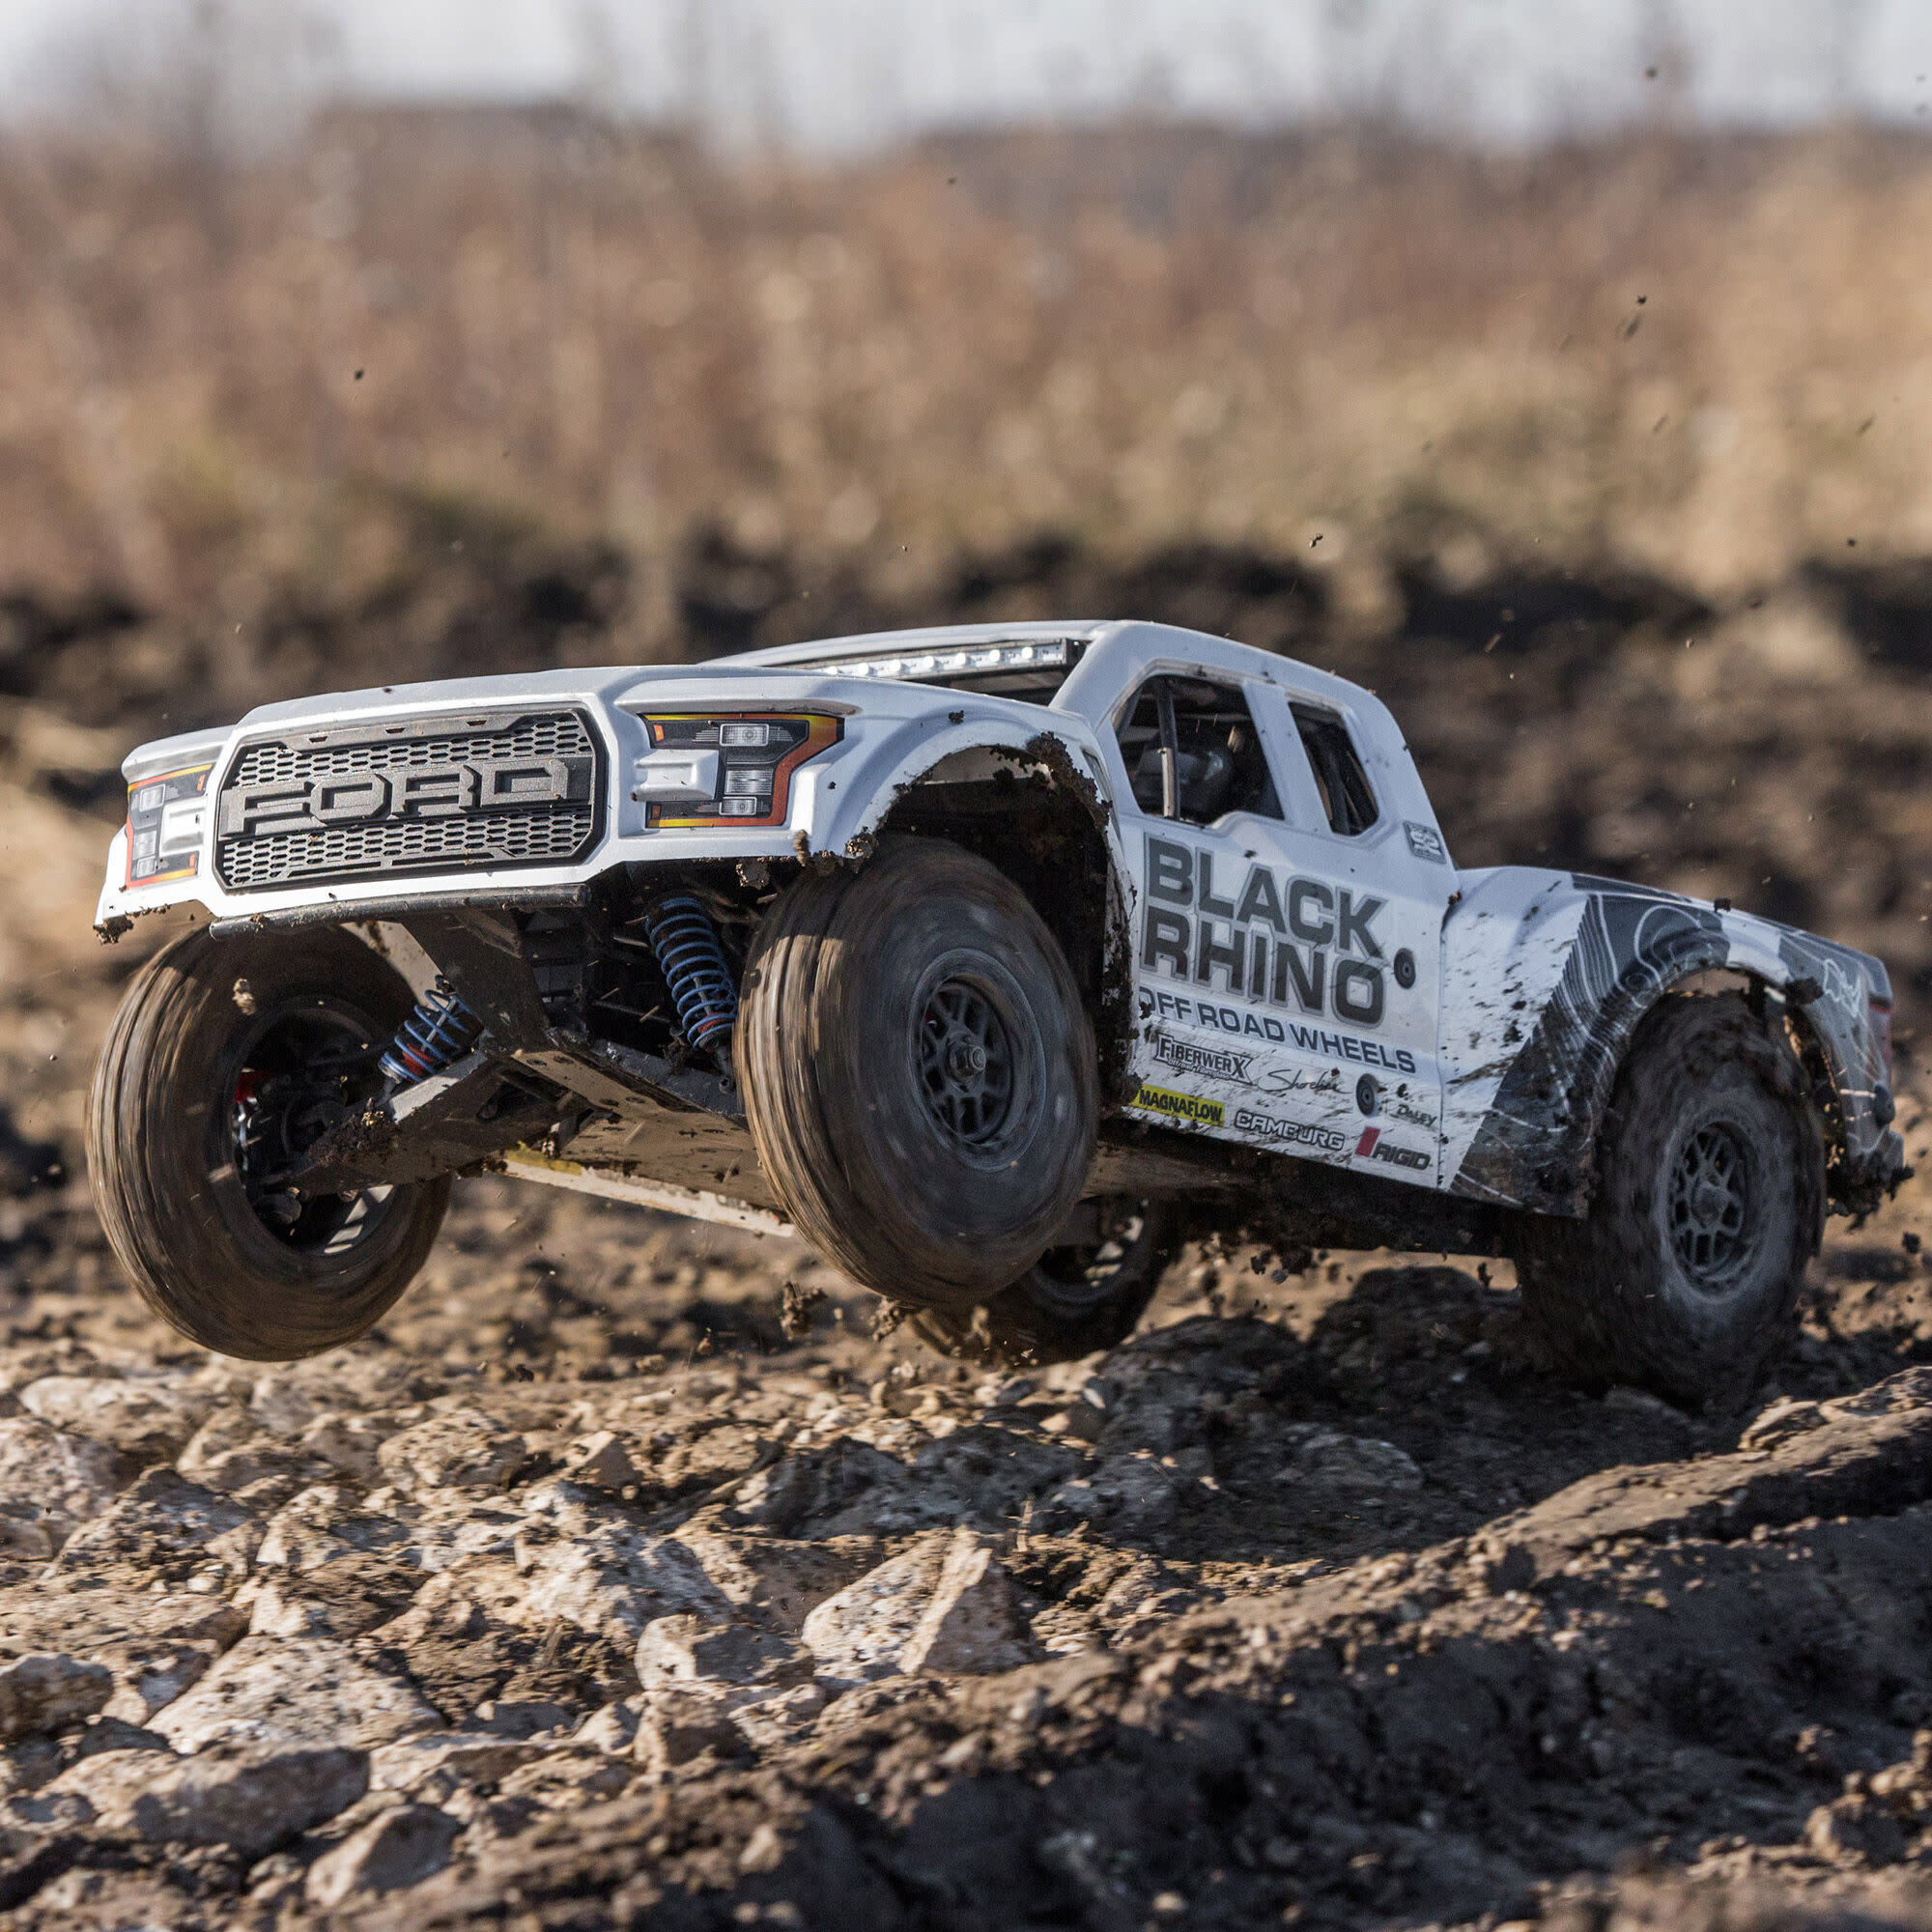 Black Rhino Ford Raptor Baja Rey SMART 1/10th RTR